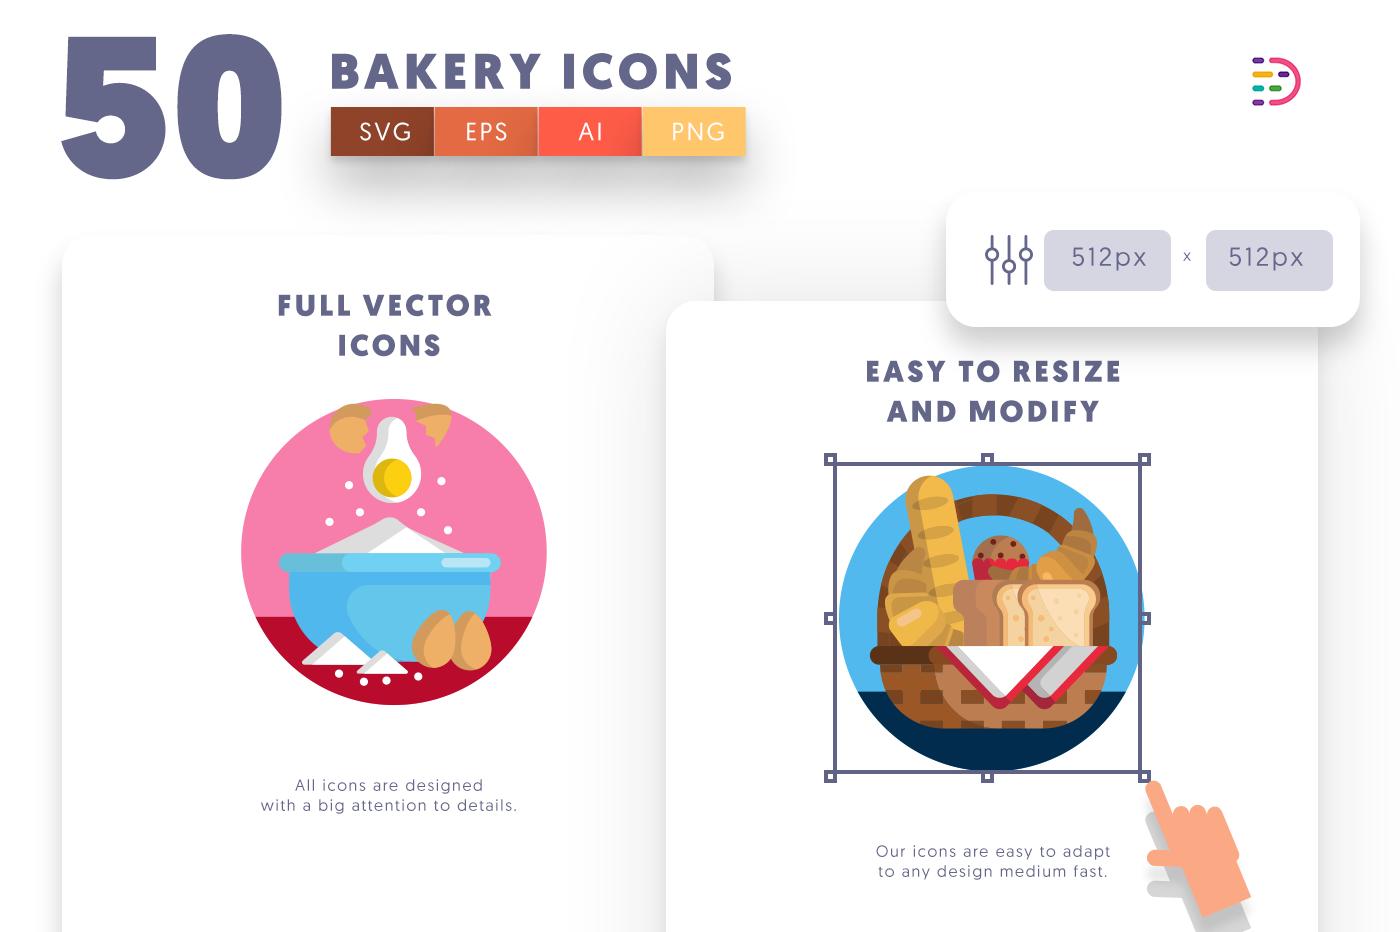 Full vector 50 Bakery Icons